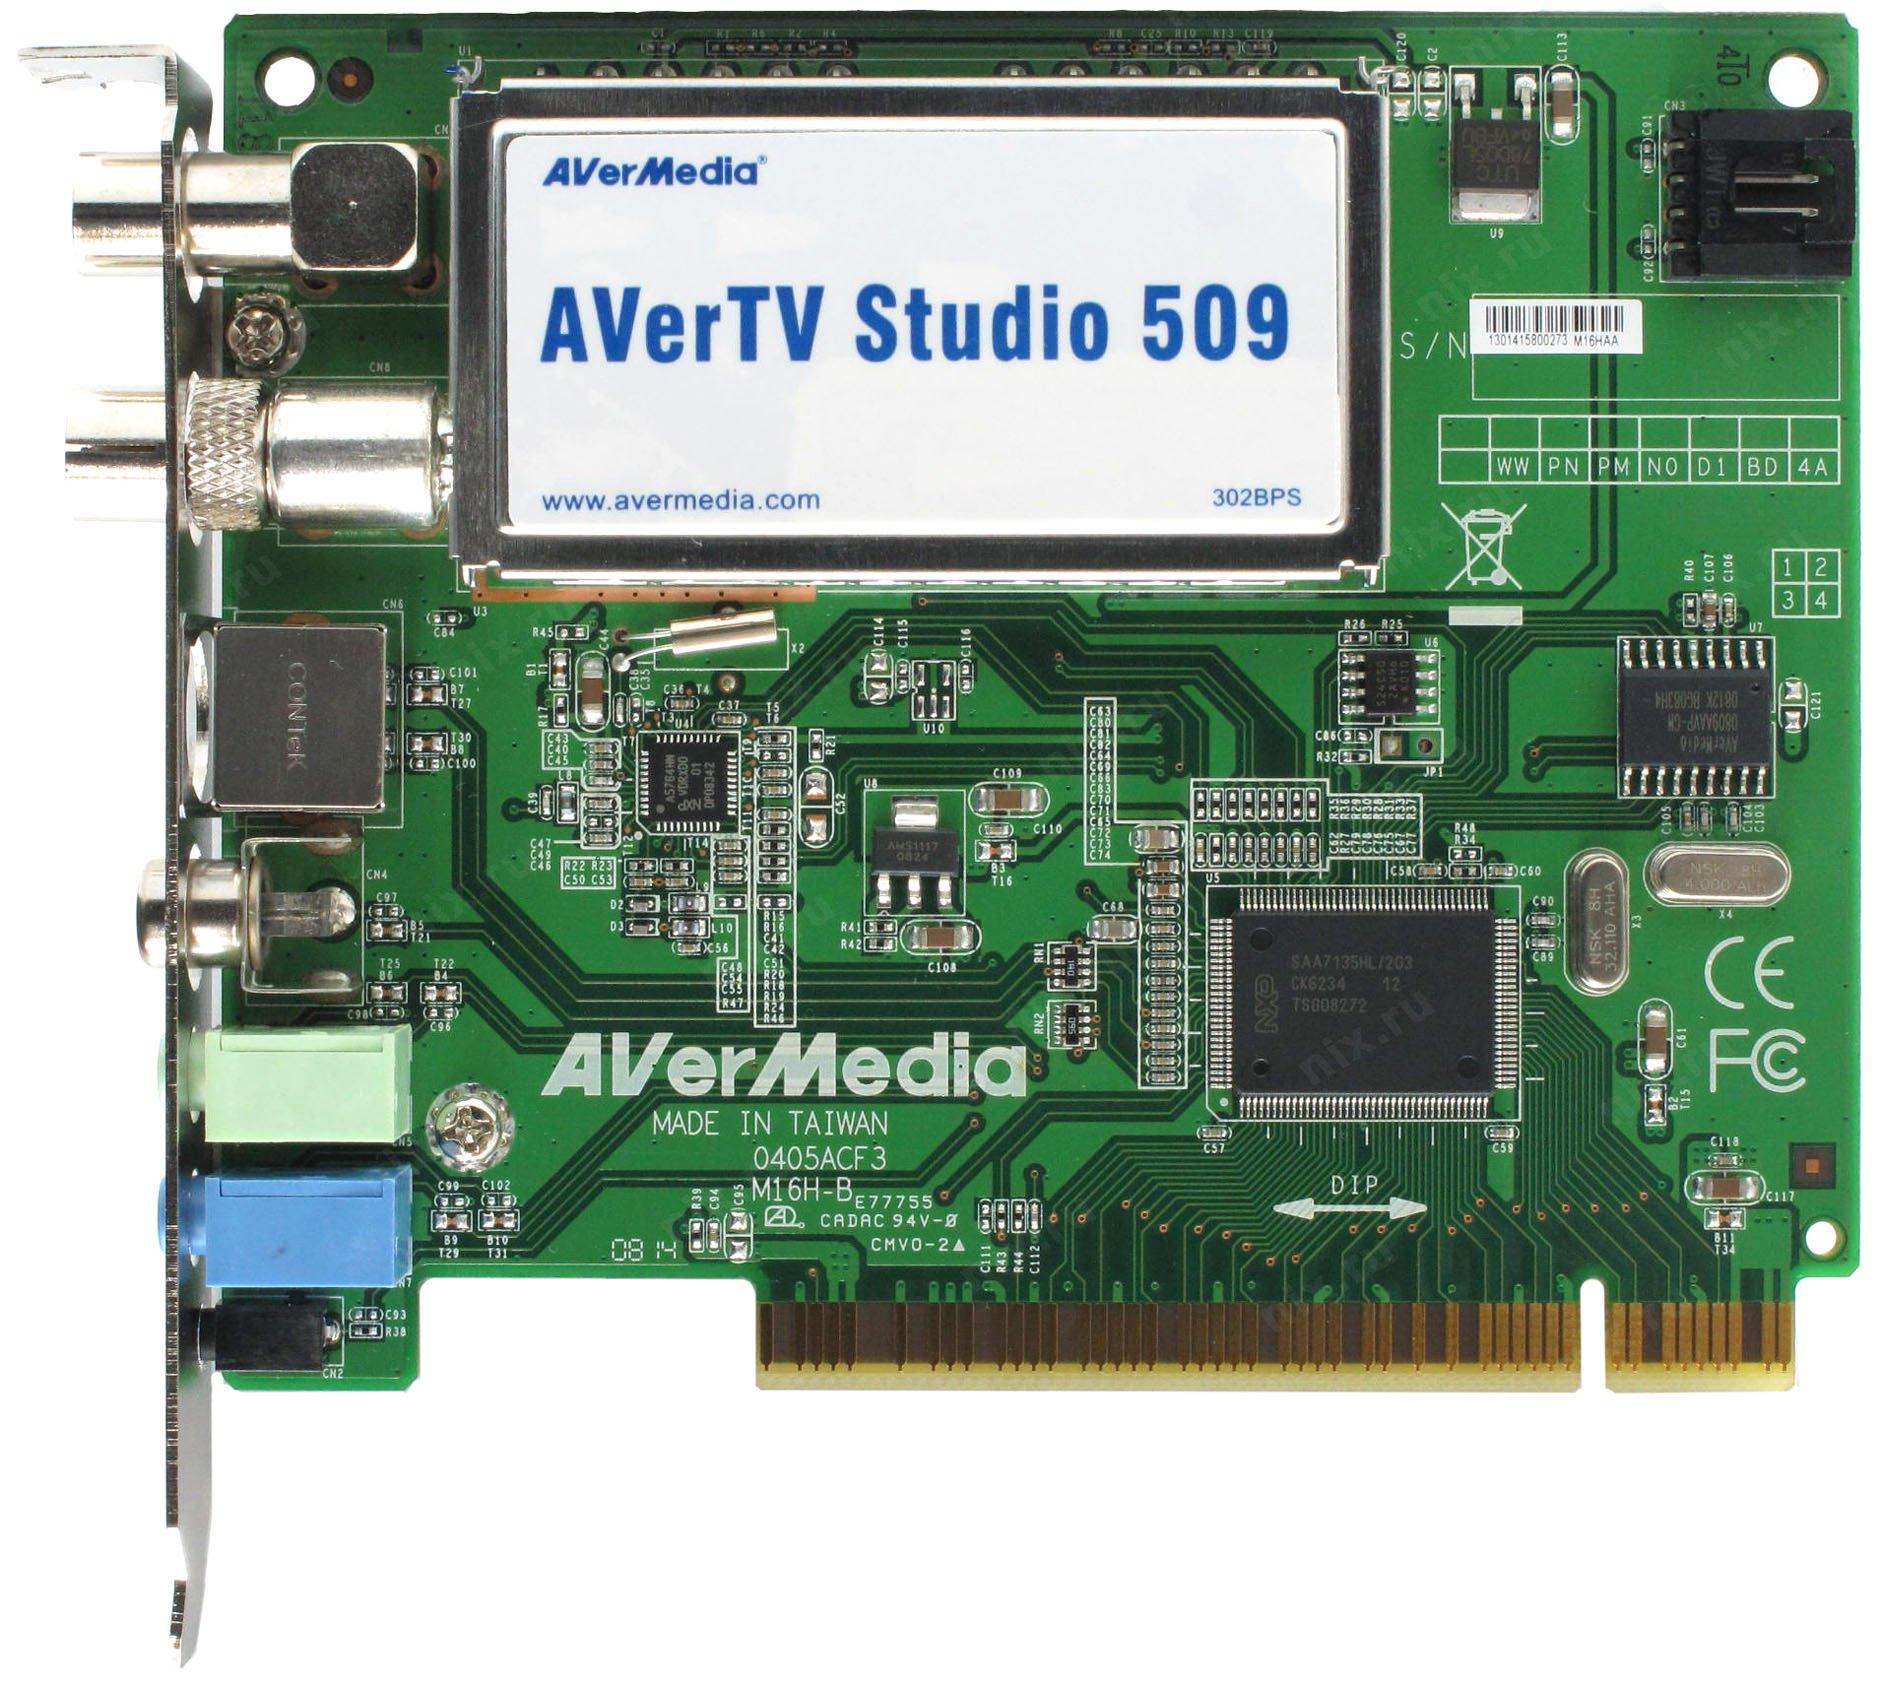 AVERMEDIA AVERTV C115 WINDOWS 8.1 DRIVER DOWNLOAD